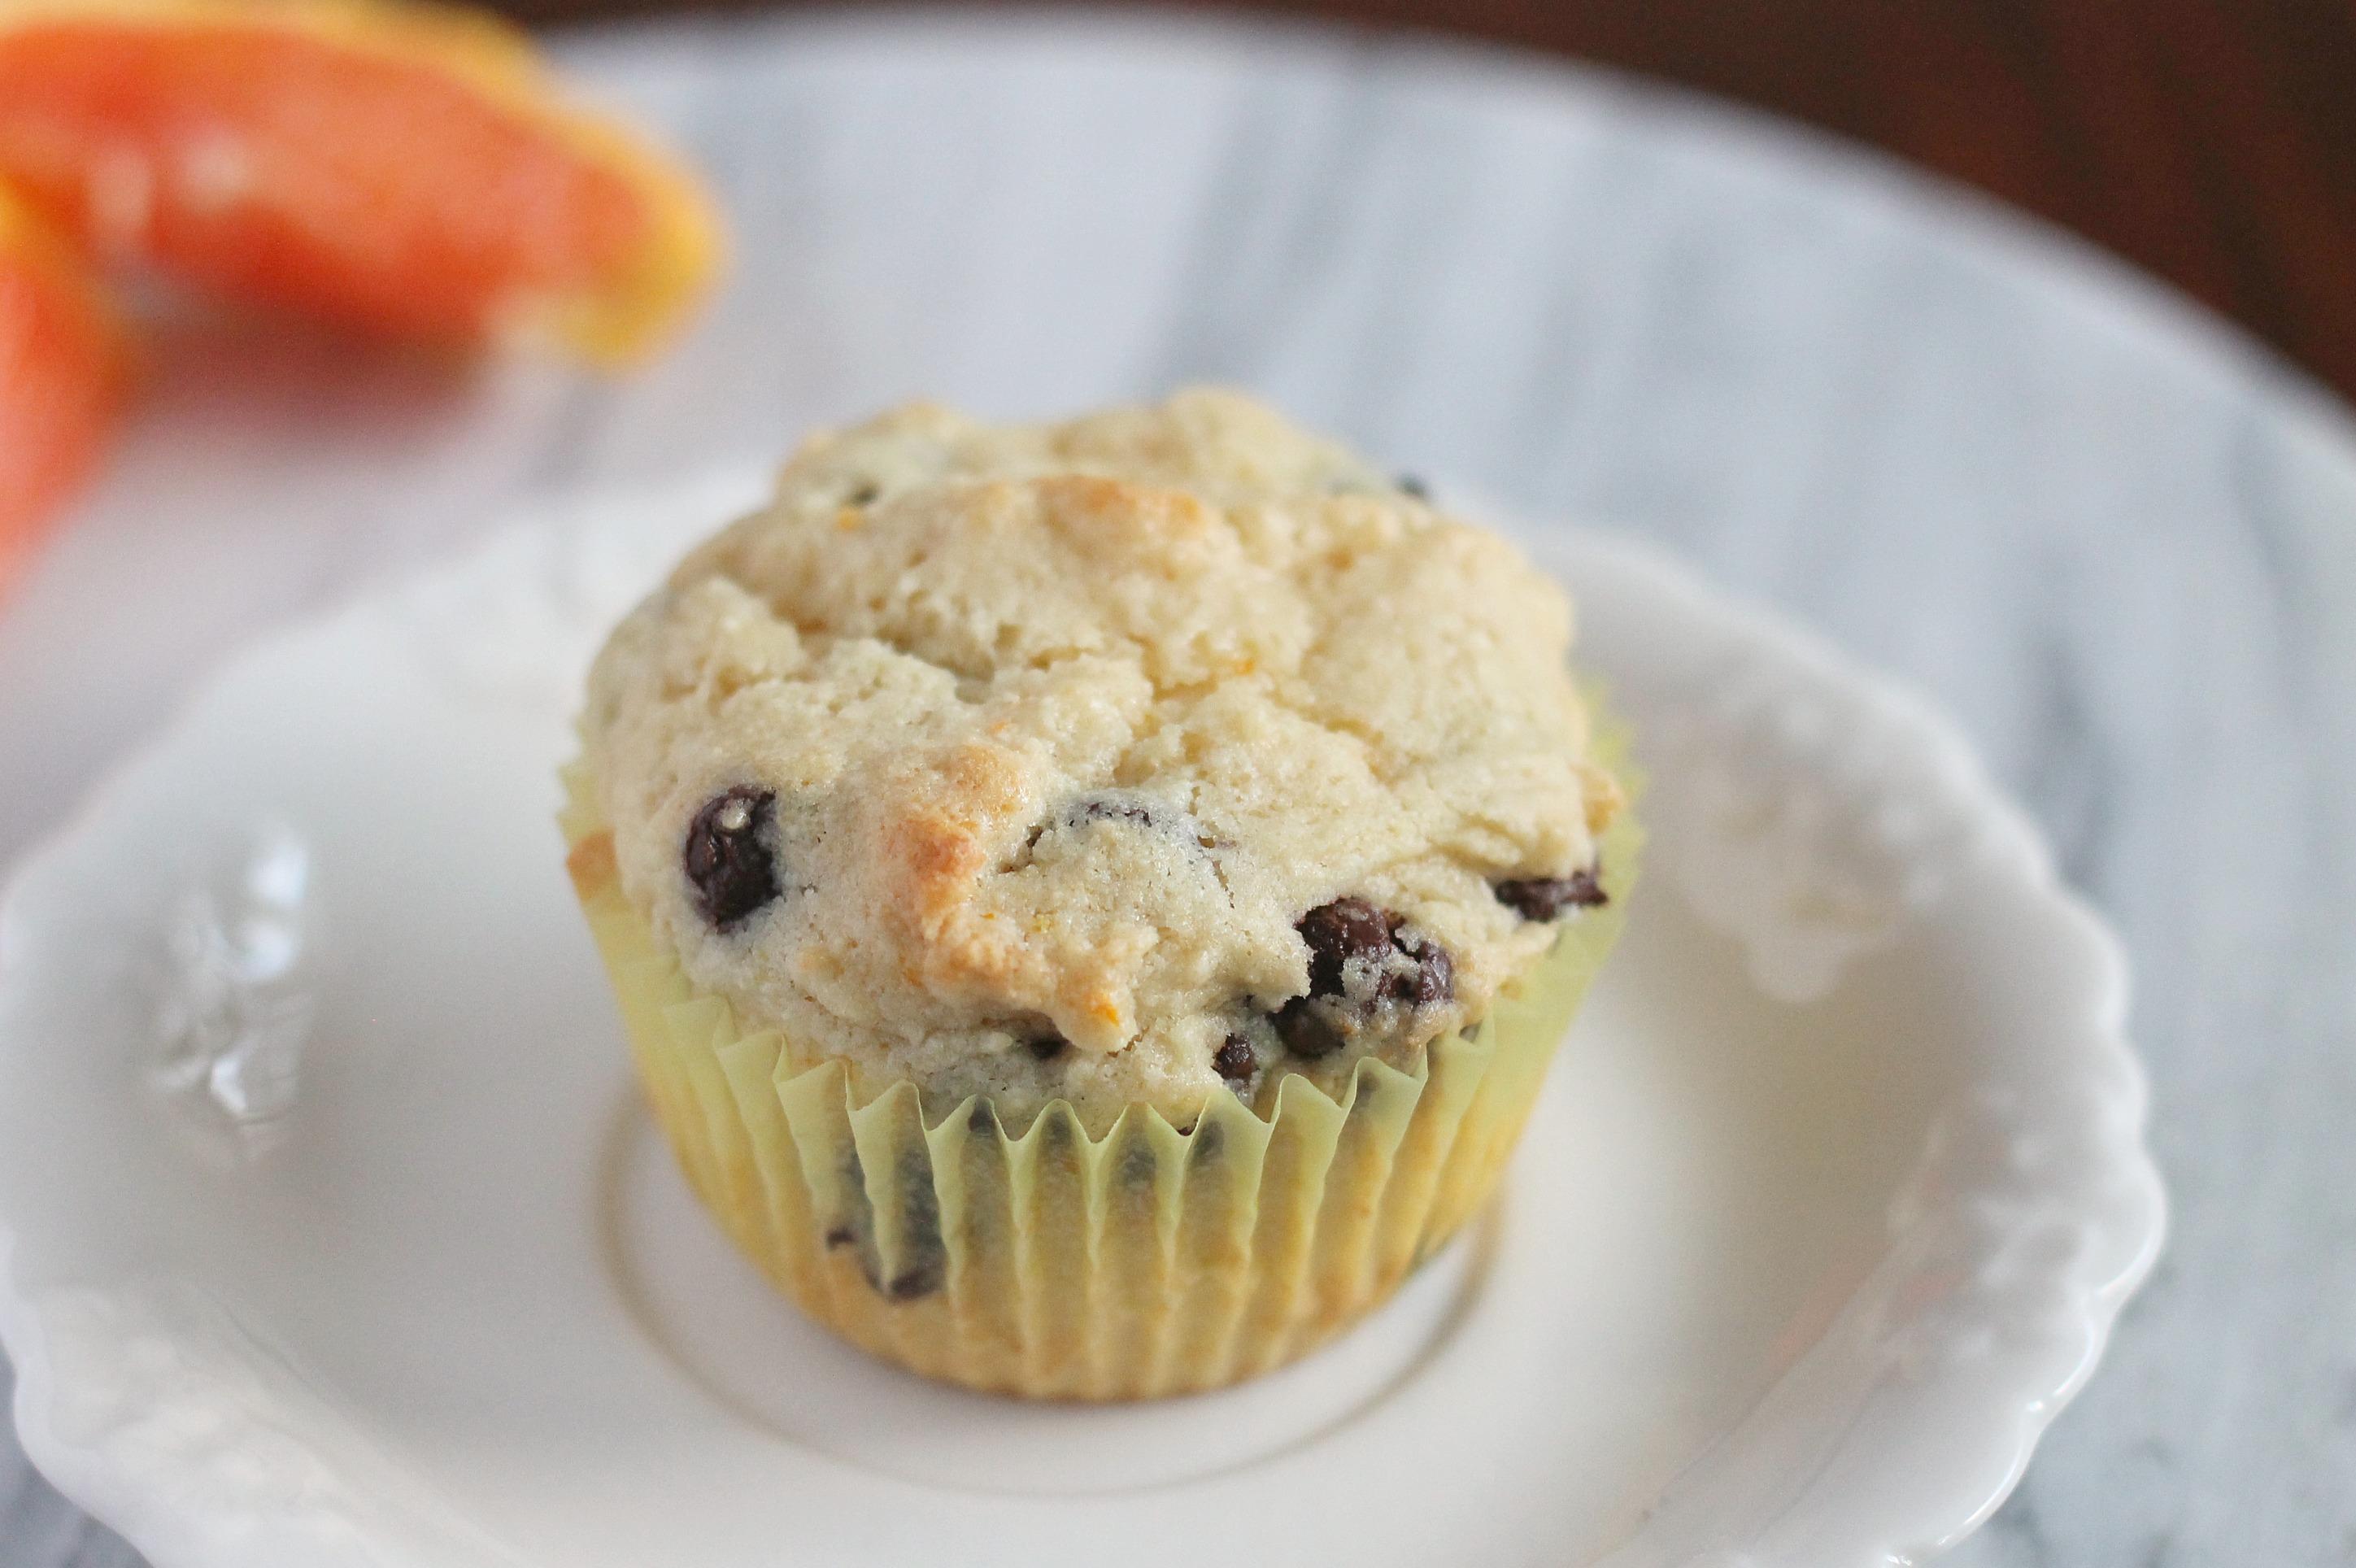 Orange Ricotta Chocolate Chip Muffins – We Like Two Cook